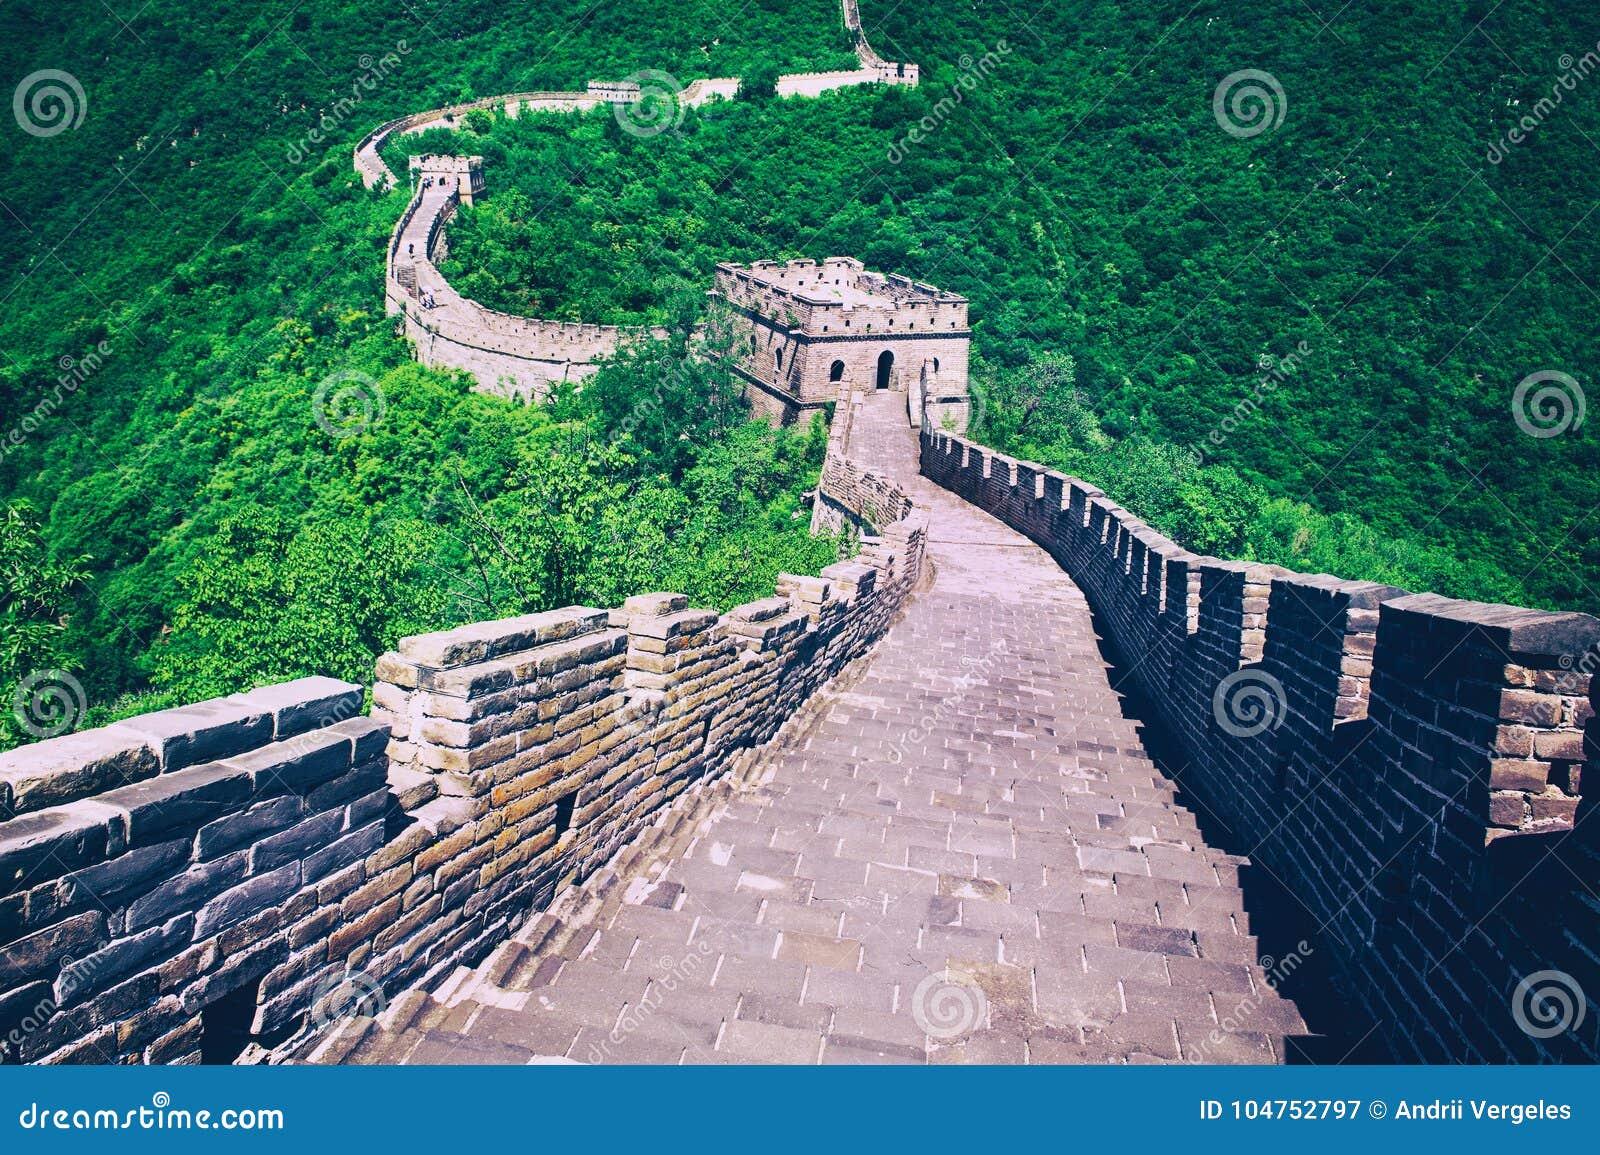 La Gran Muralla de China La Gran Muralla de China es una serie de fuerte